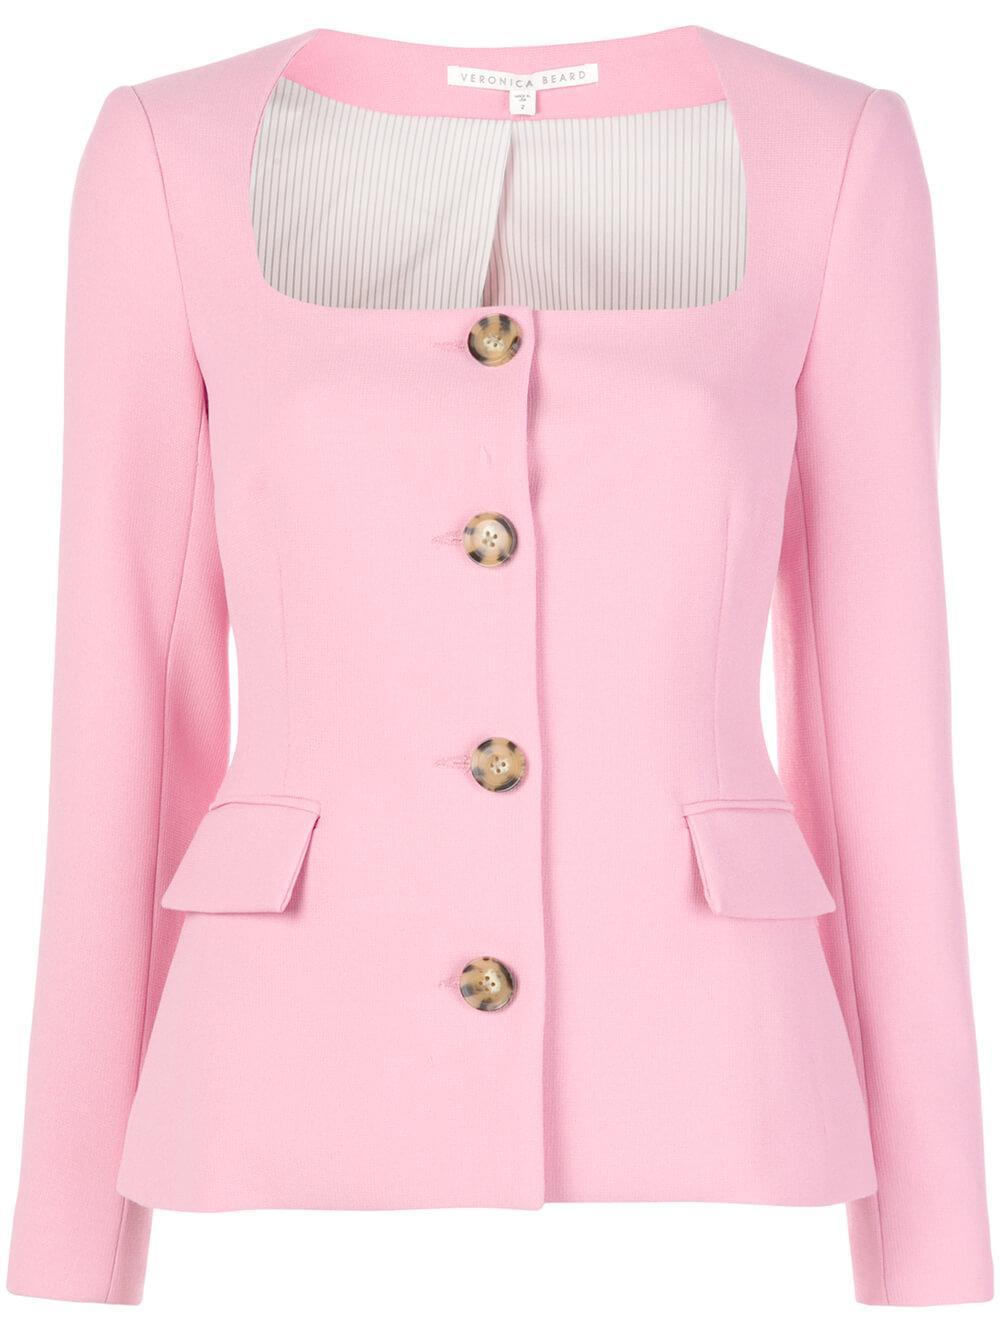 Ria Button Front Jacket Item # 2002SU0171626